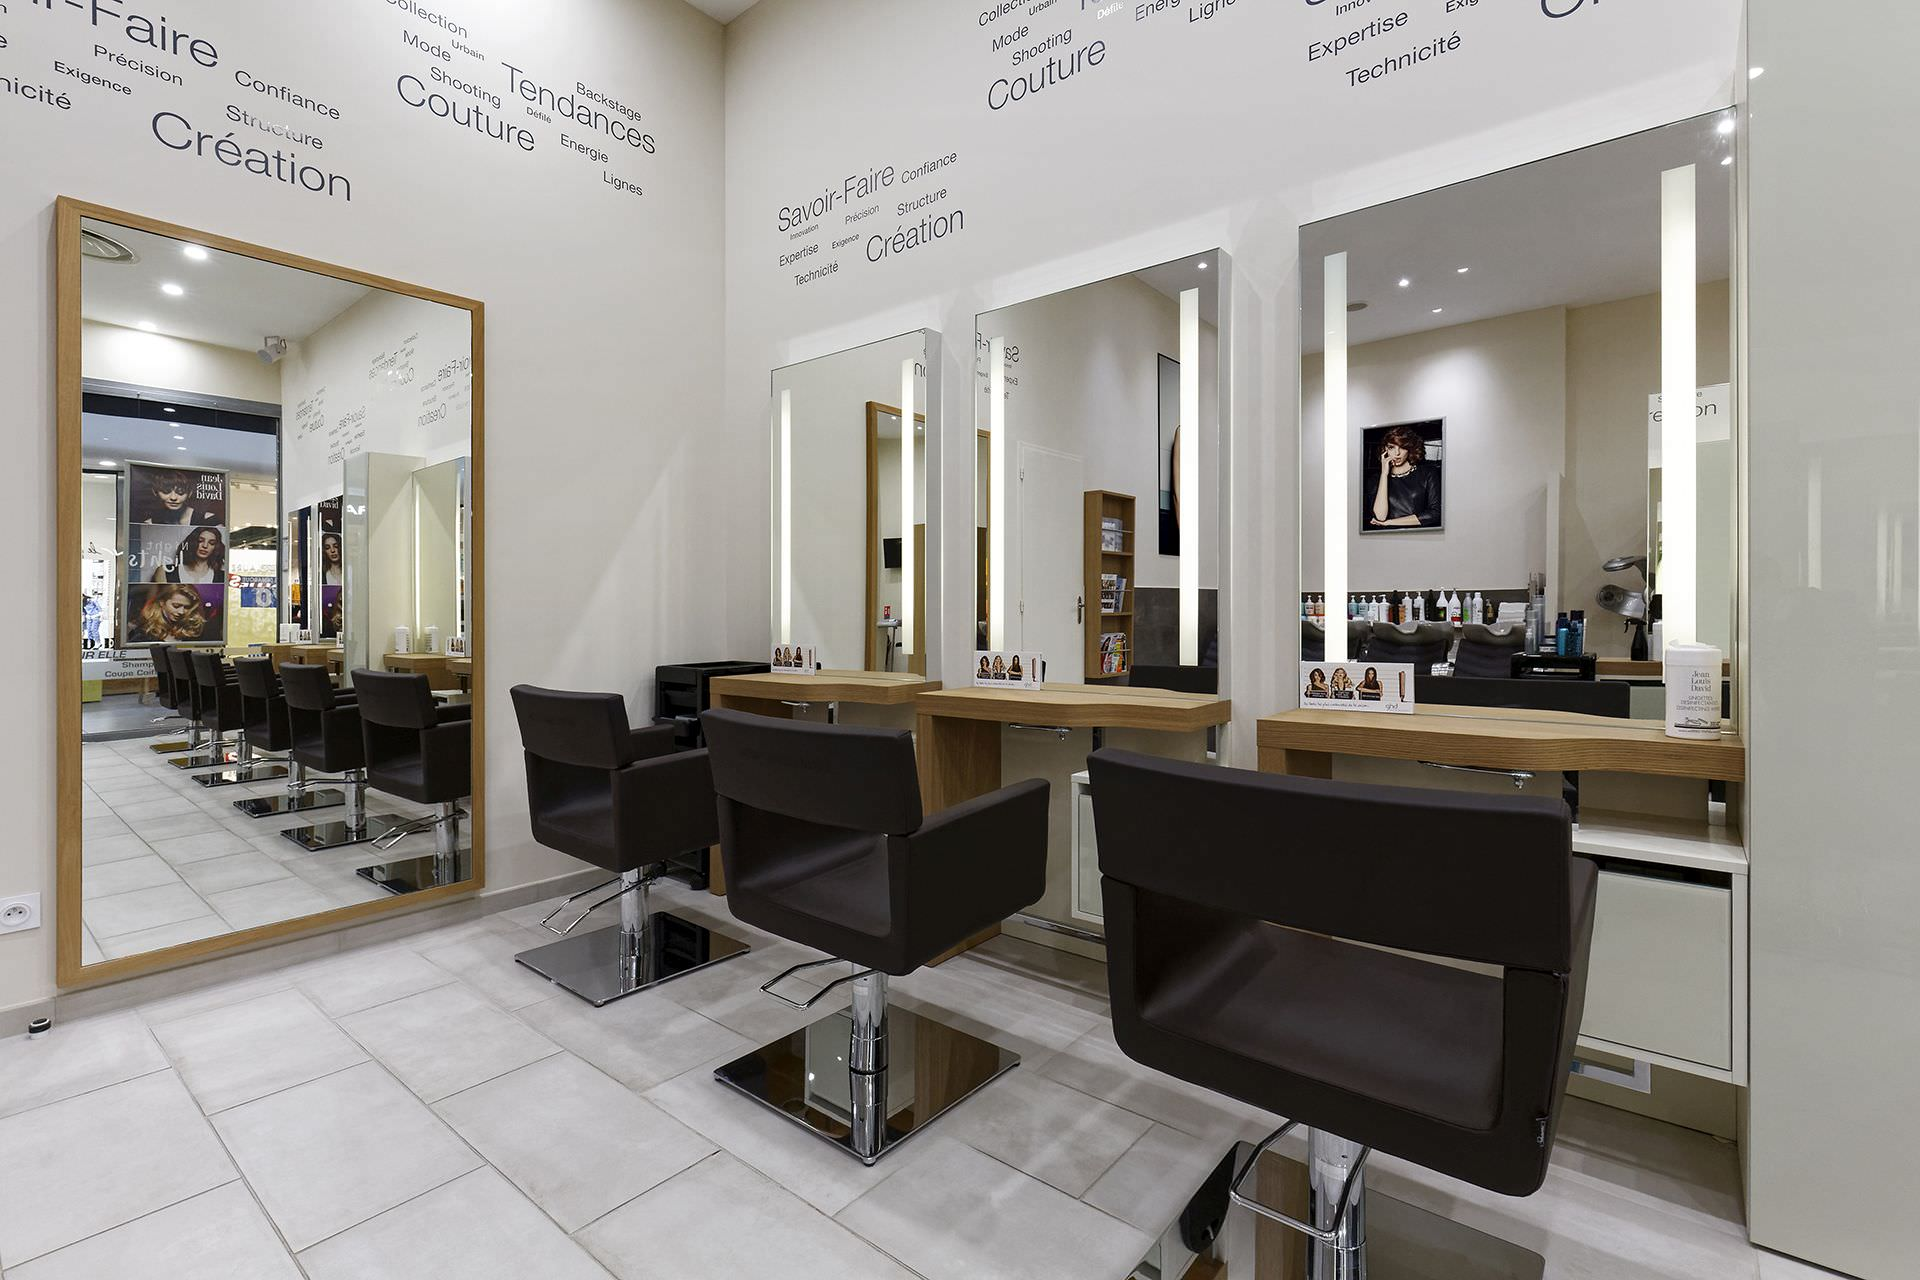 renovation-salon-coiffure-jean-louis-david-007